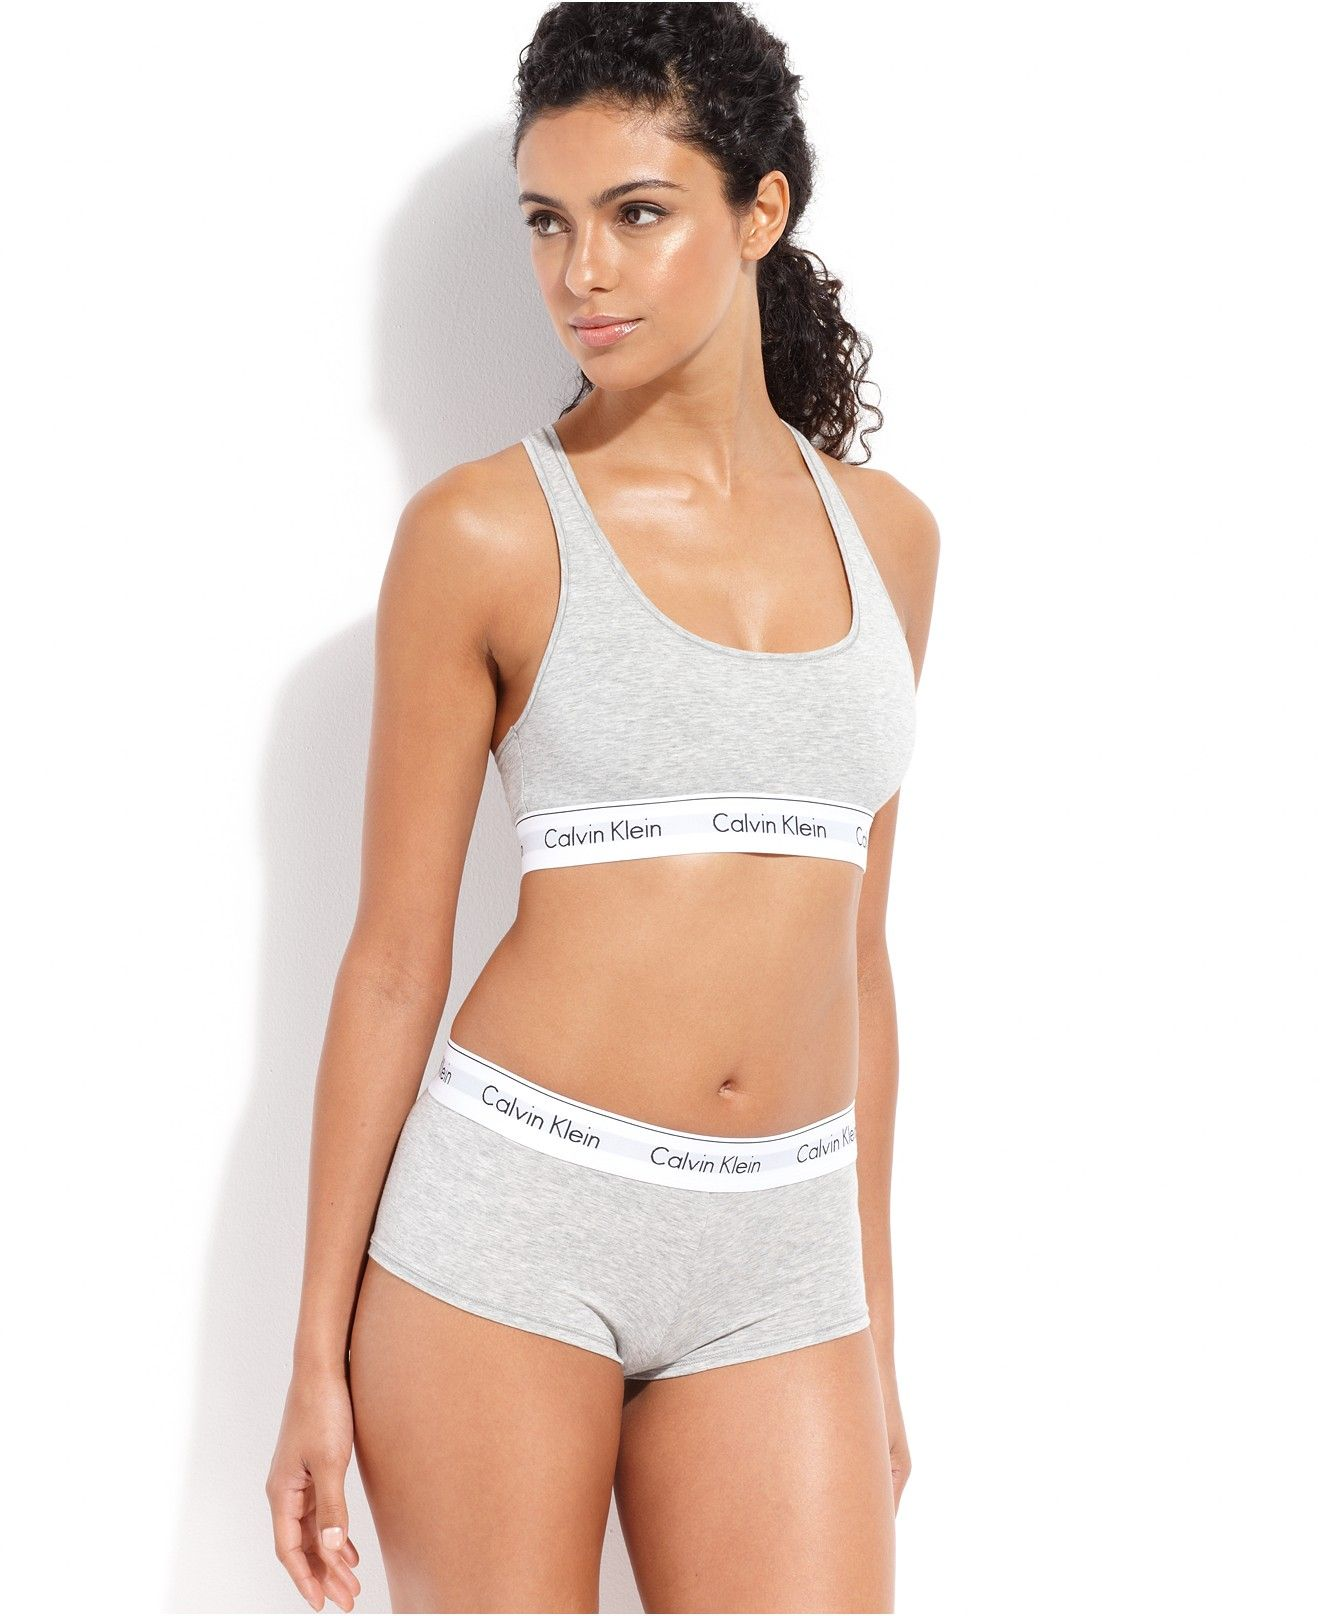 dc91252638 Calvin Klein Modern Cotton Logo Bralette F3785 - Lingerie - Women - Macy s